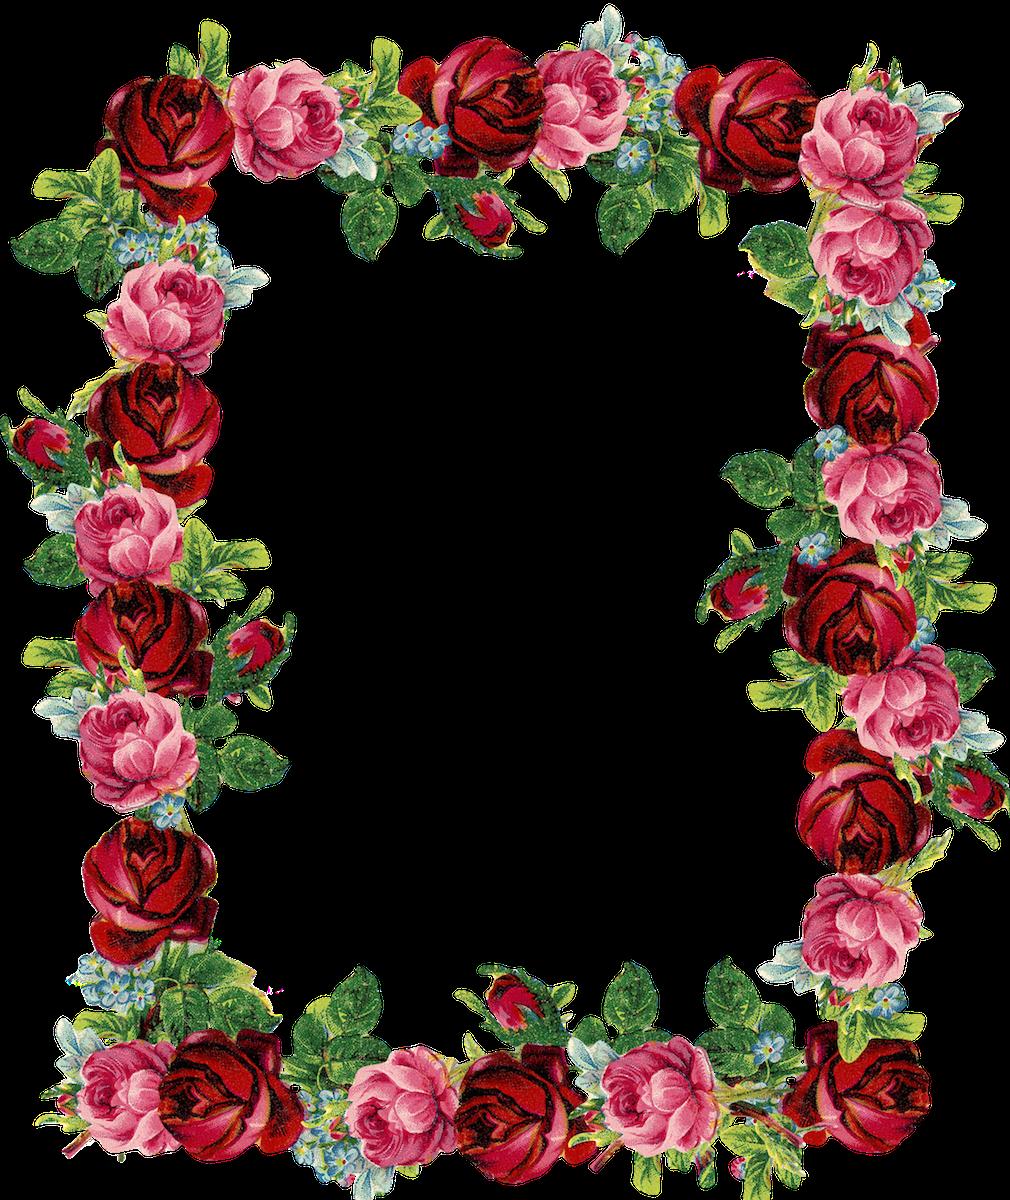 1010x1200 Free Digital Vintage Rose Frame And Border (Png With Transparent